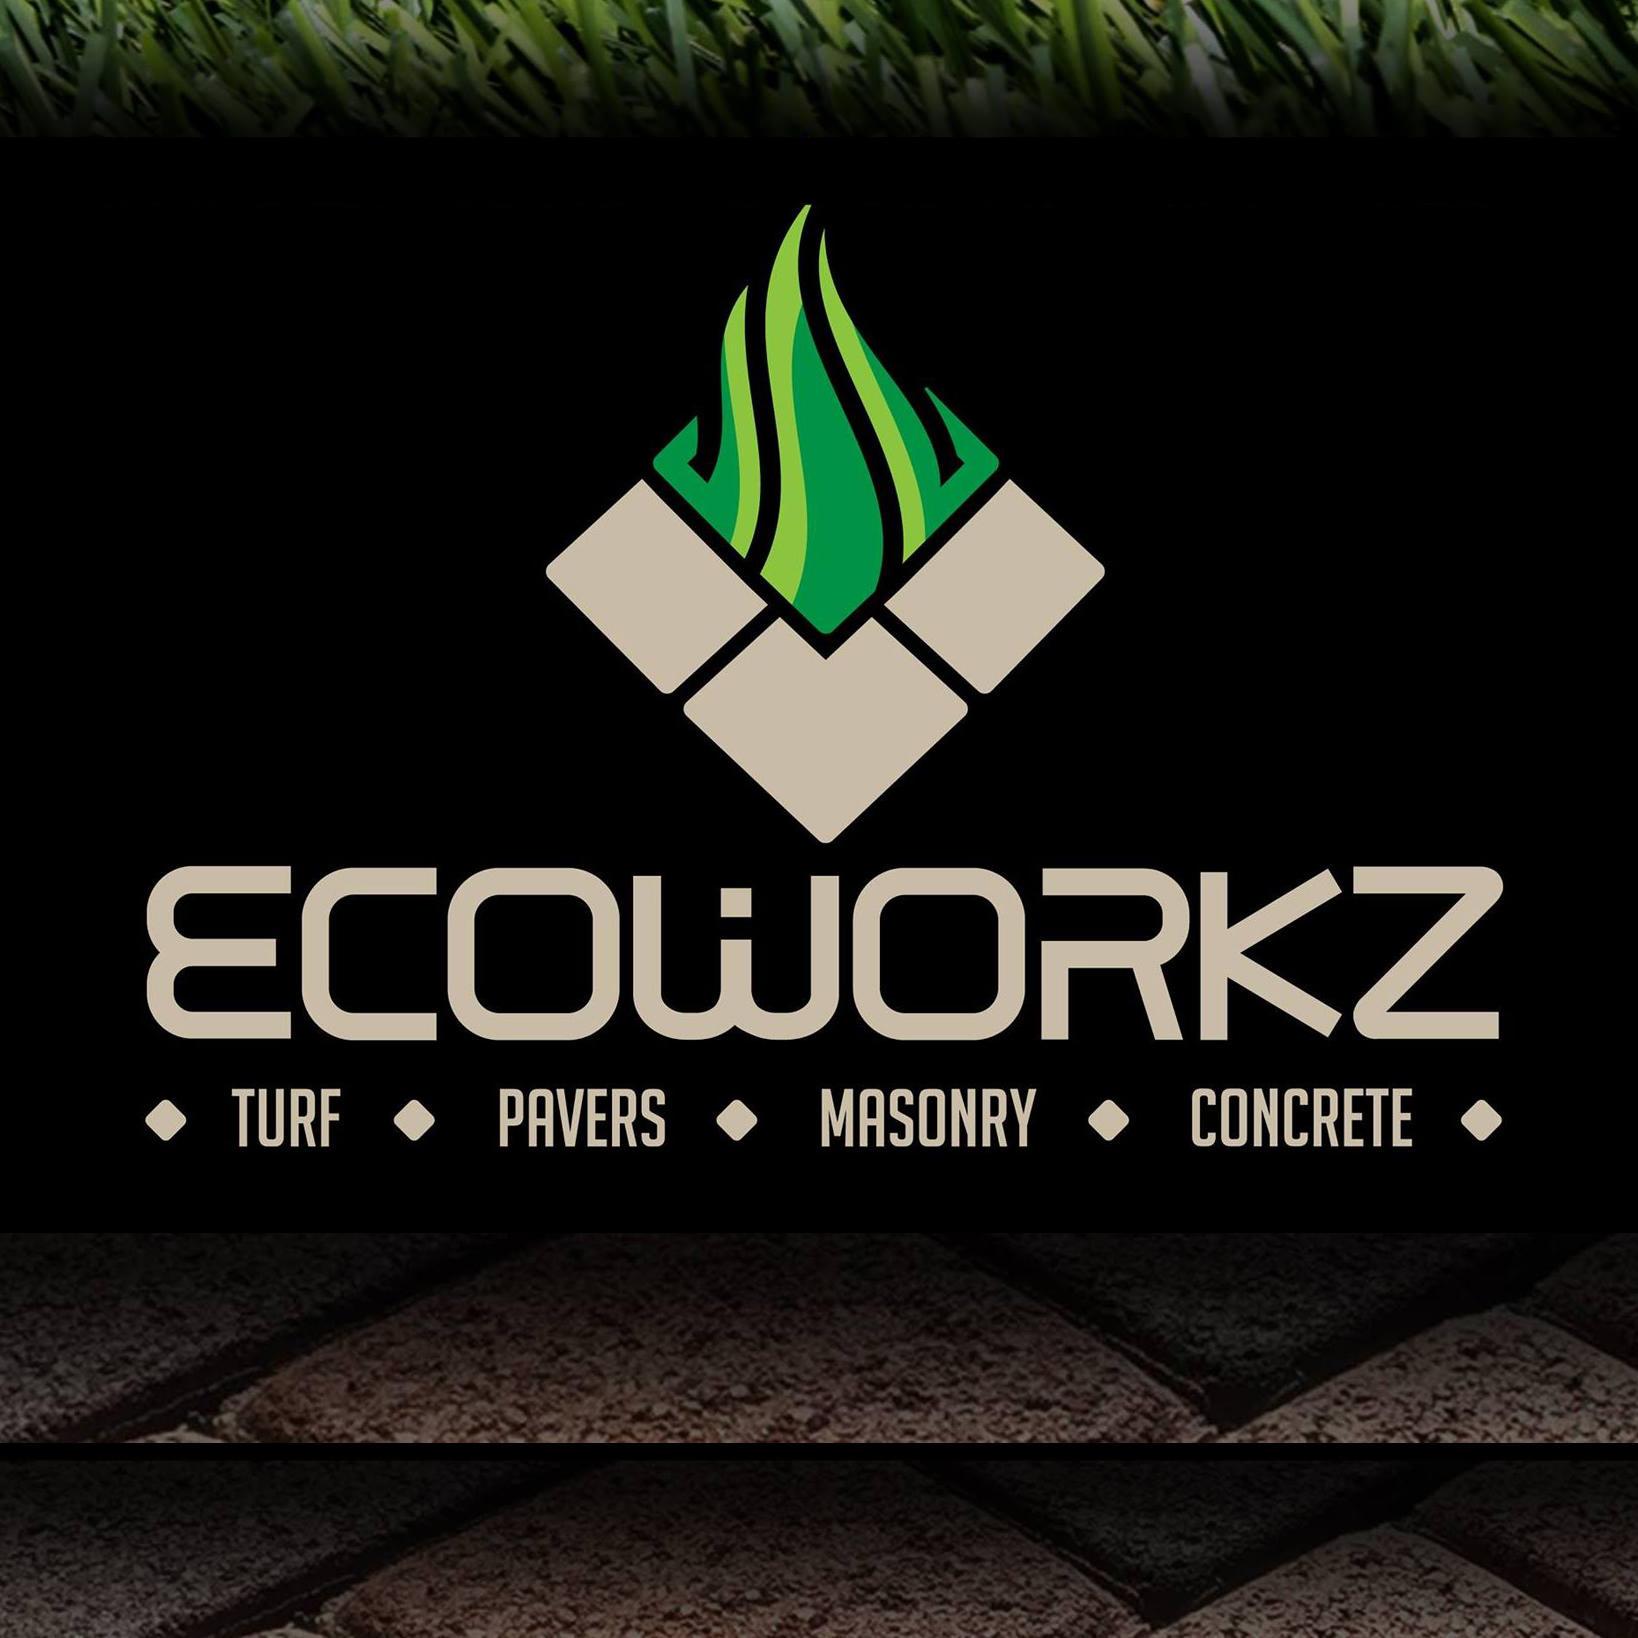 Ecoworkz Inc. - Brea, CA 92821 - (714)582-7800 | ShowMeLocal.com